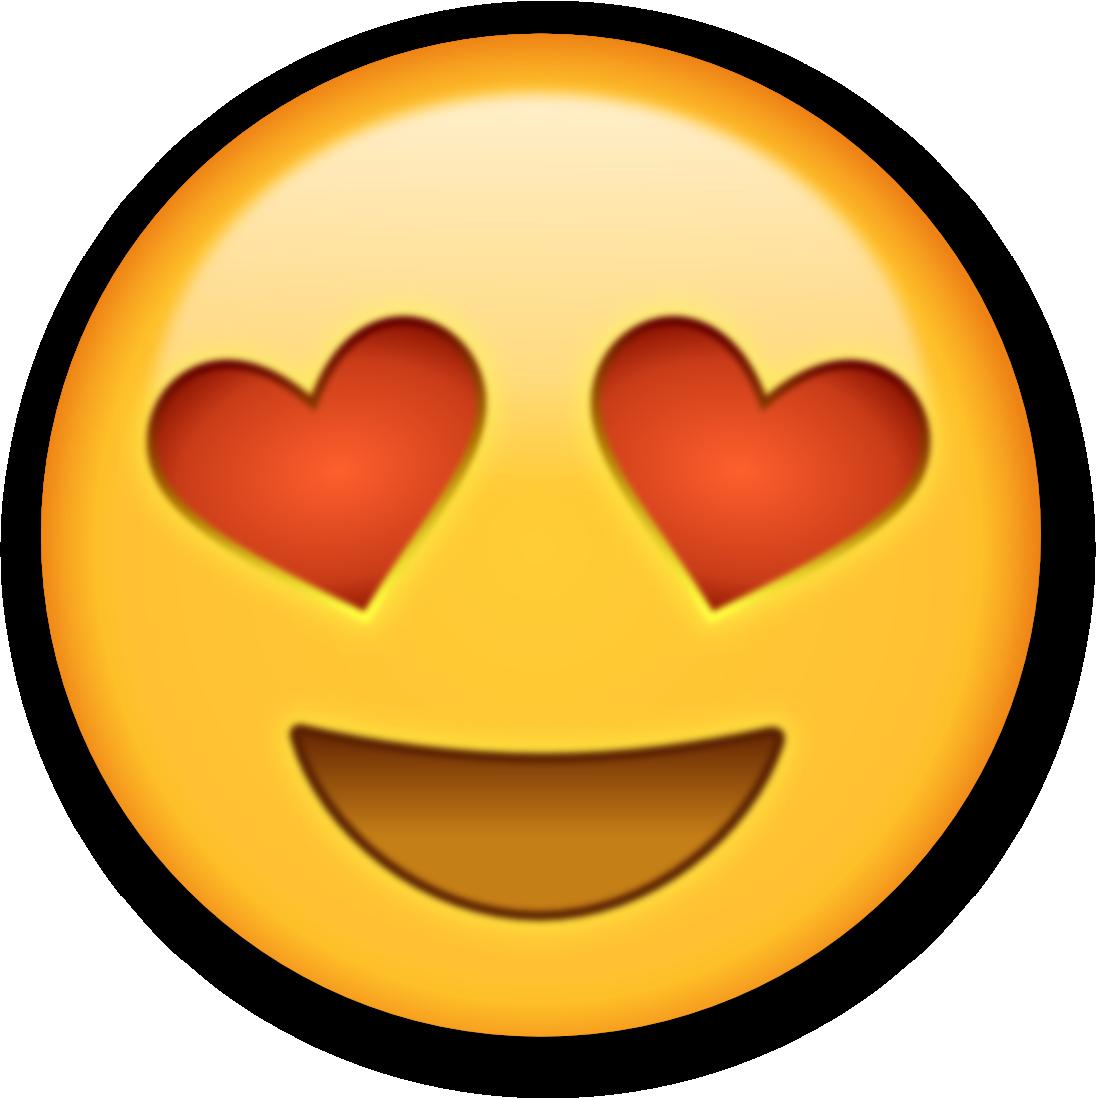 Clipart emojis svg stock Free Free Emoji Clipart, Download Free Clip Art, Free Clip Art on ... svg stock